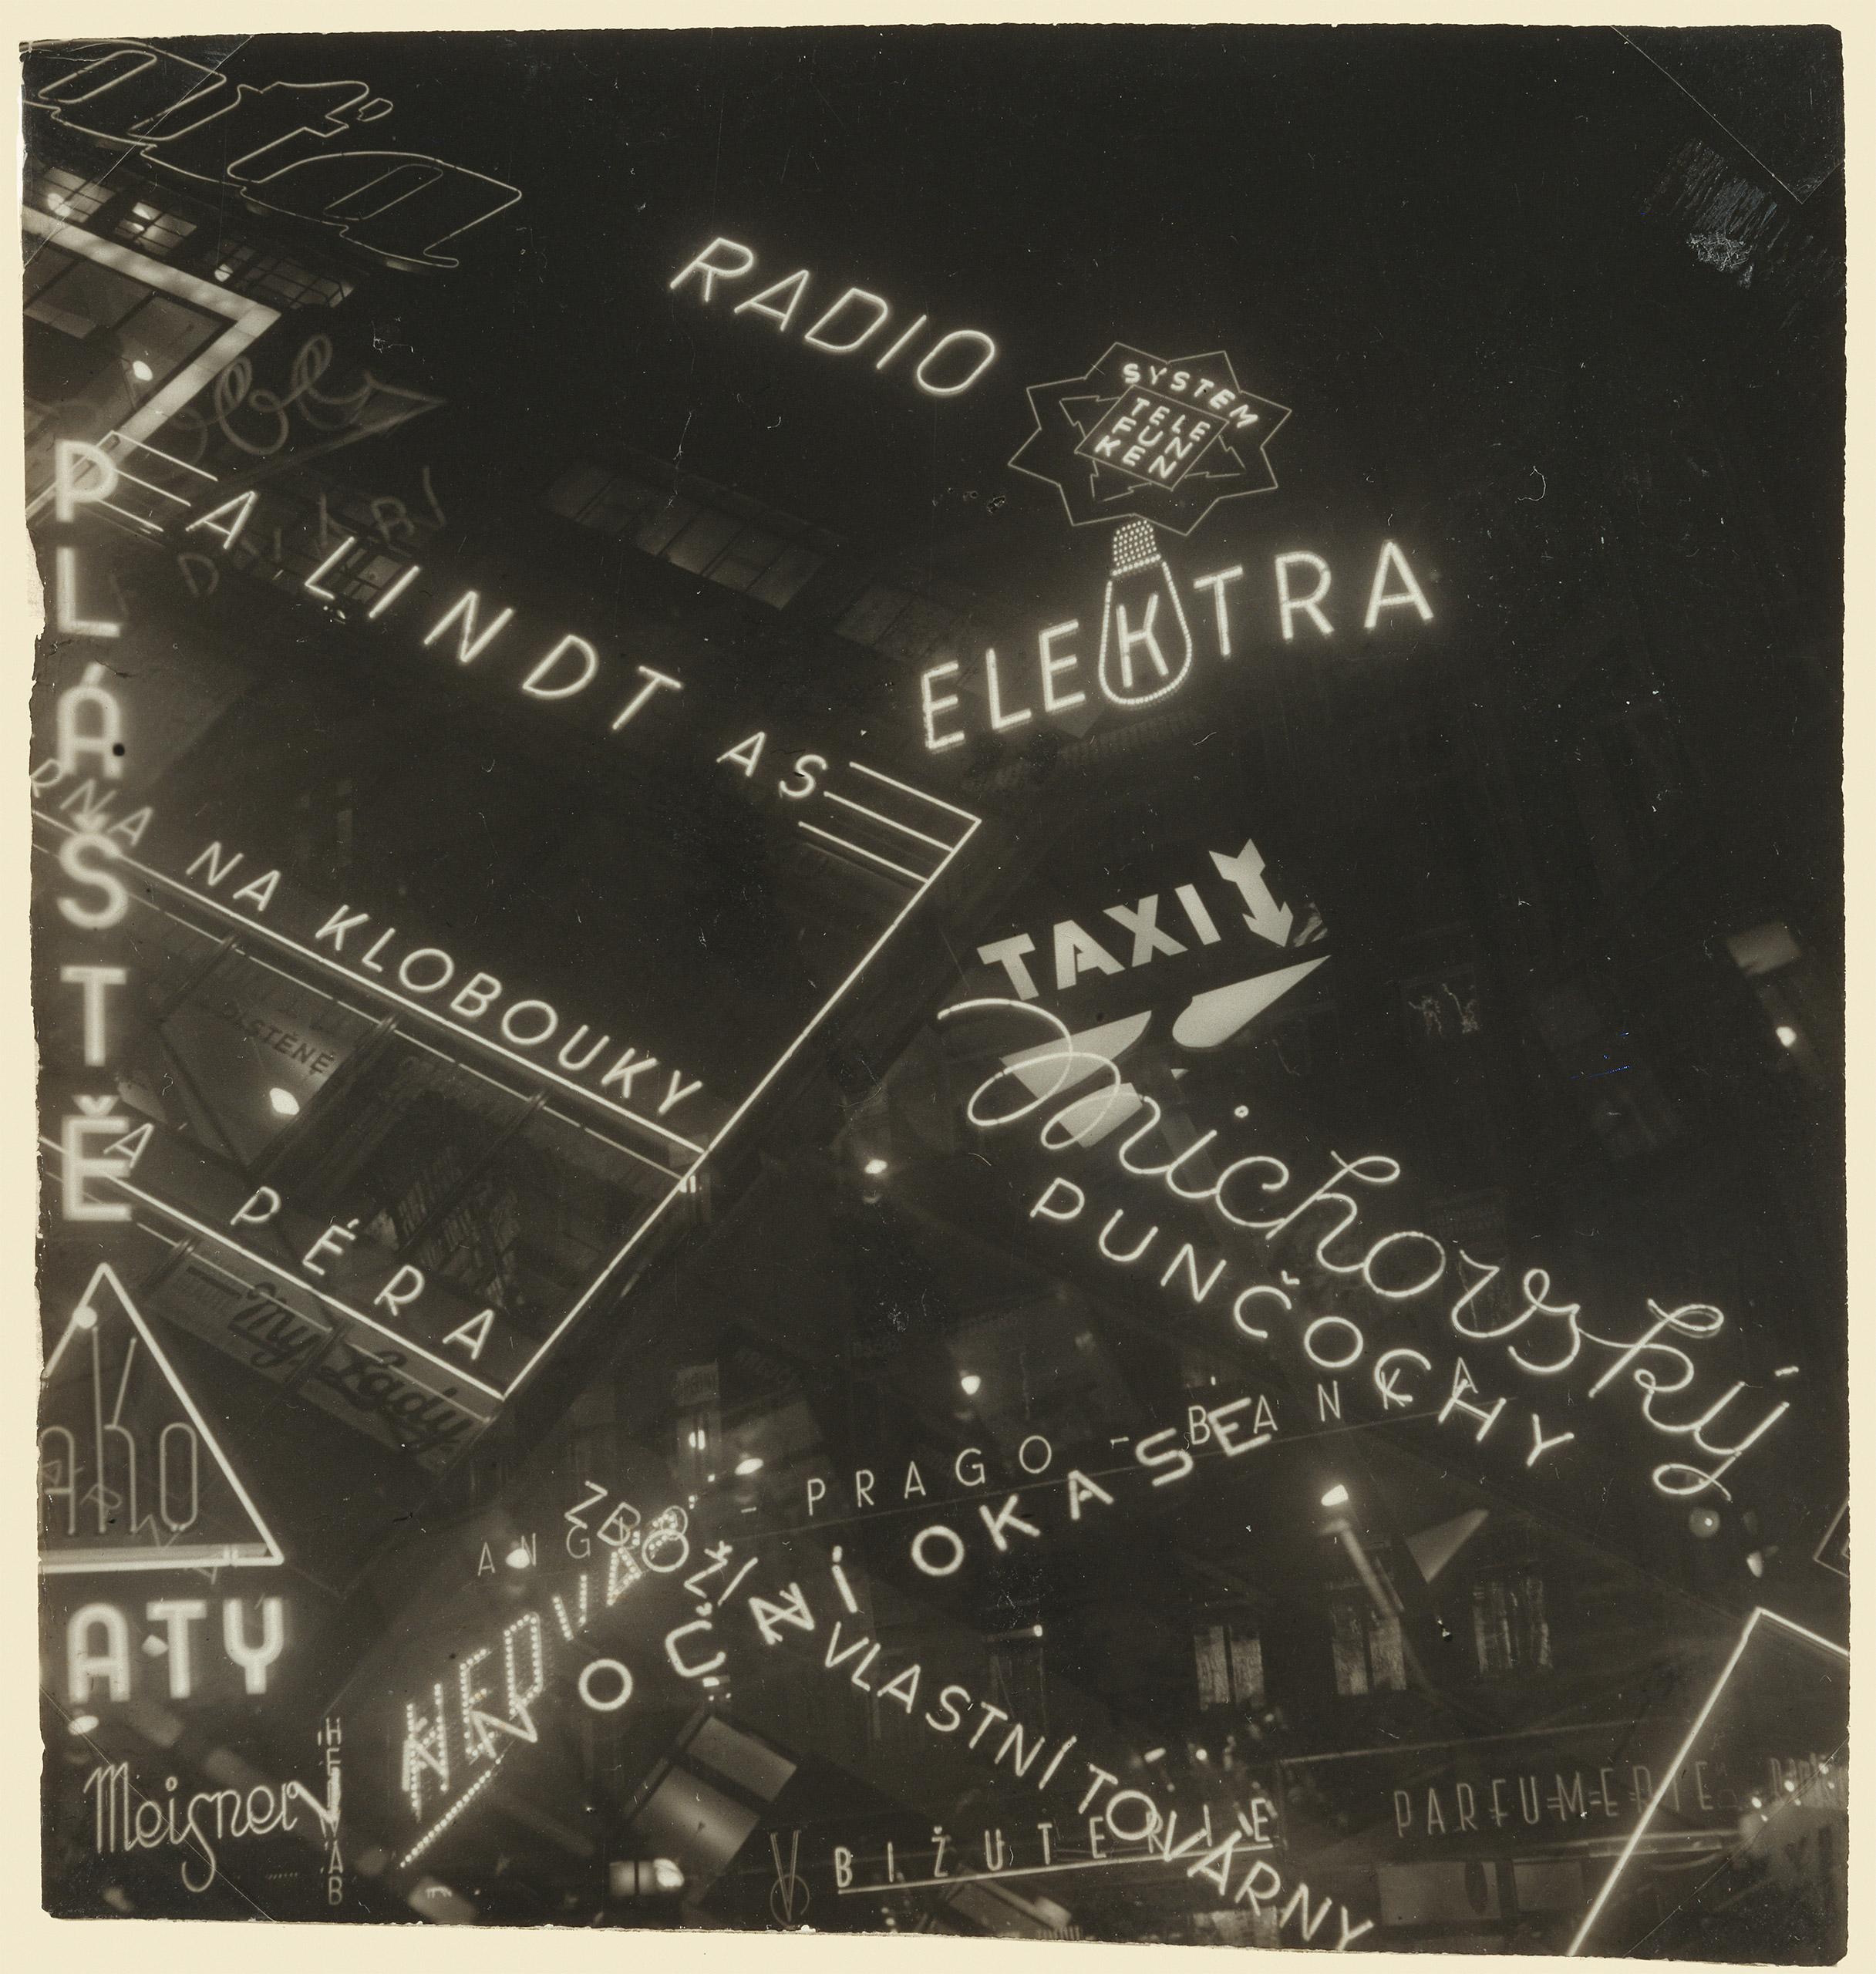 [Neon Signs], 1930 - 1939Miloslava Rupesová / The J. Paul Getty Museum, Los Angeles